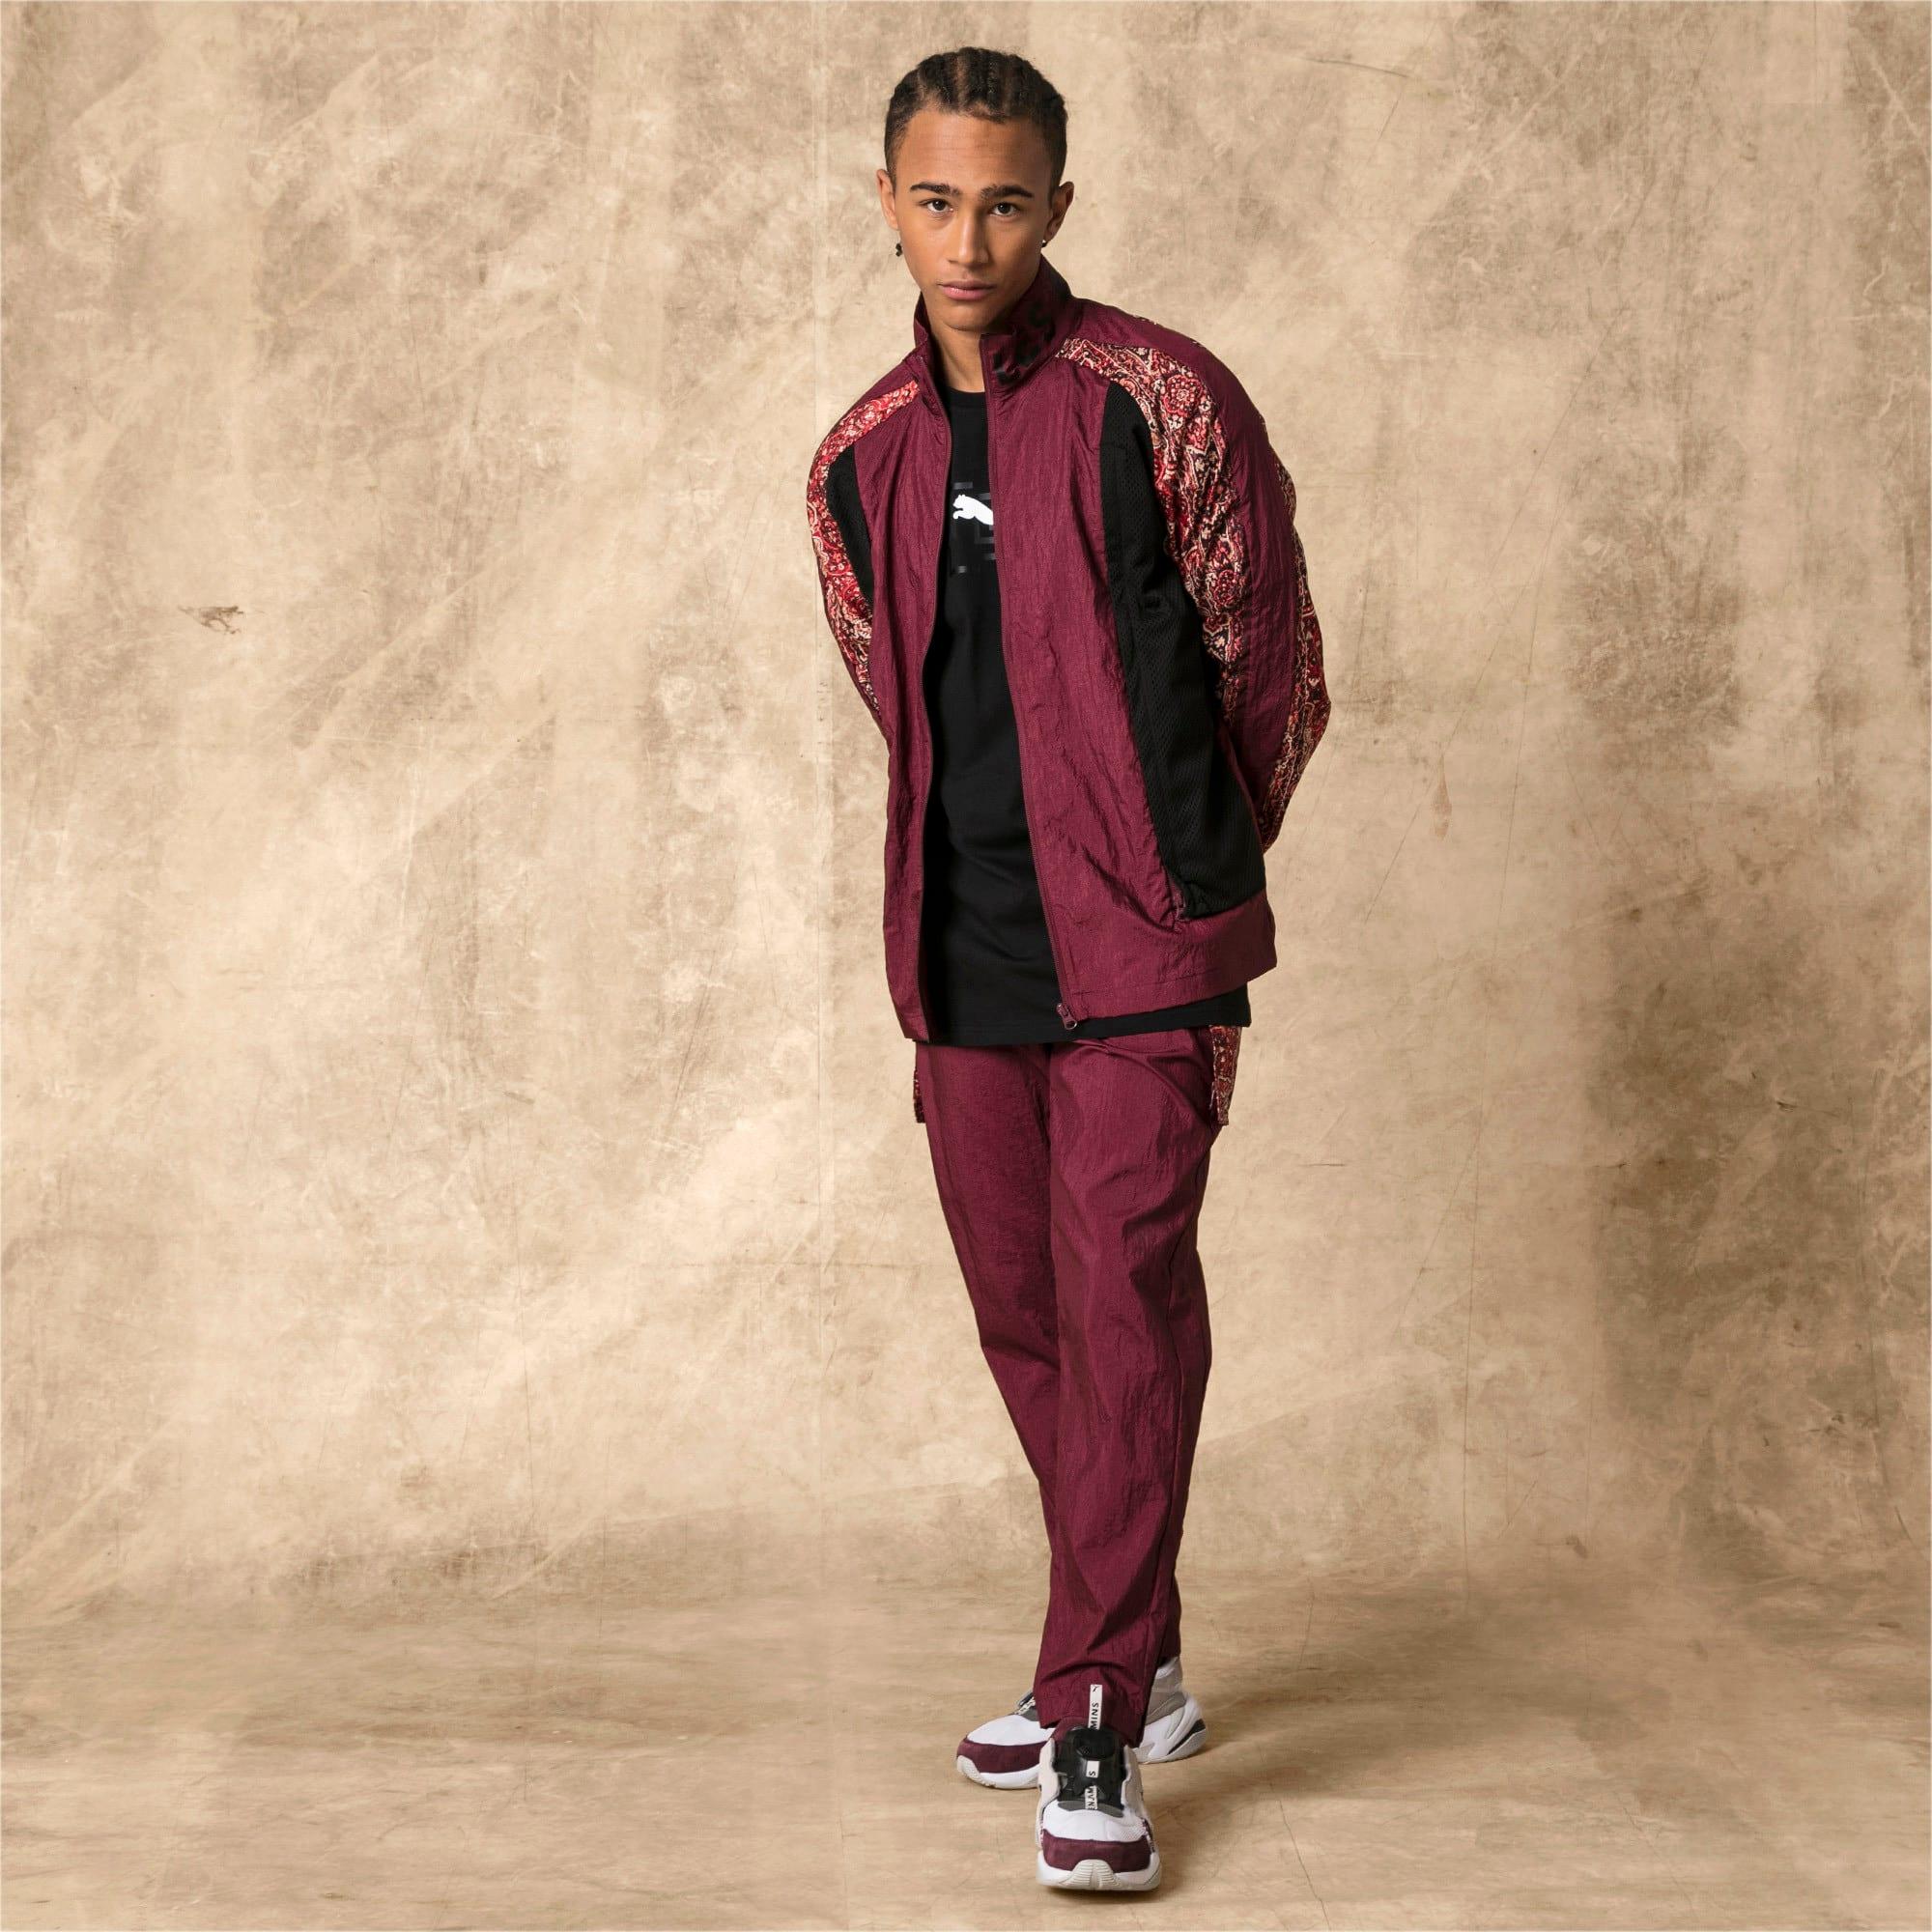 Thumbnail 5 of PUMA x LES BENJAMINS Men's Track Jacket, Burgundy, medium